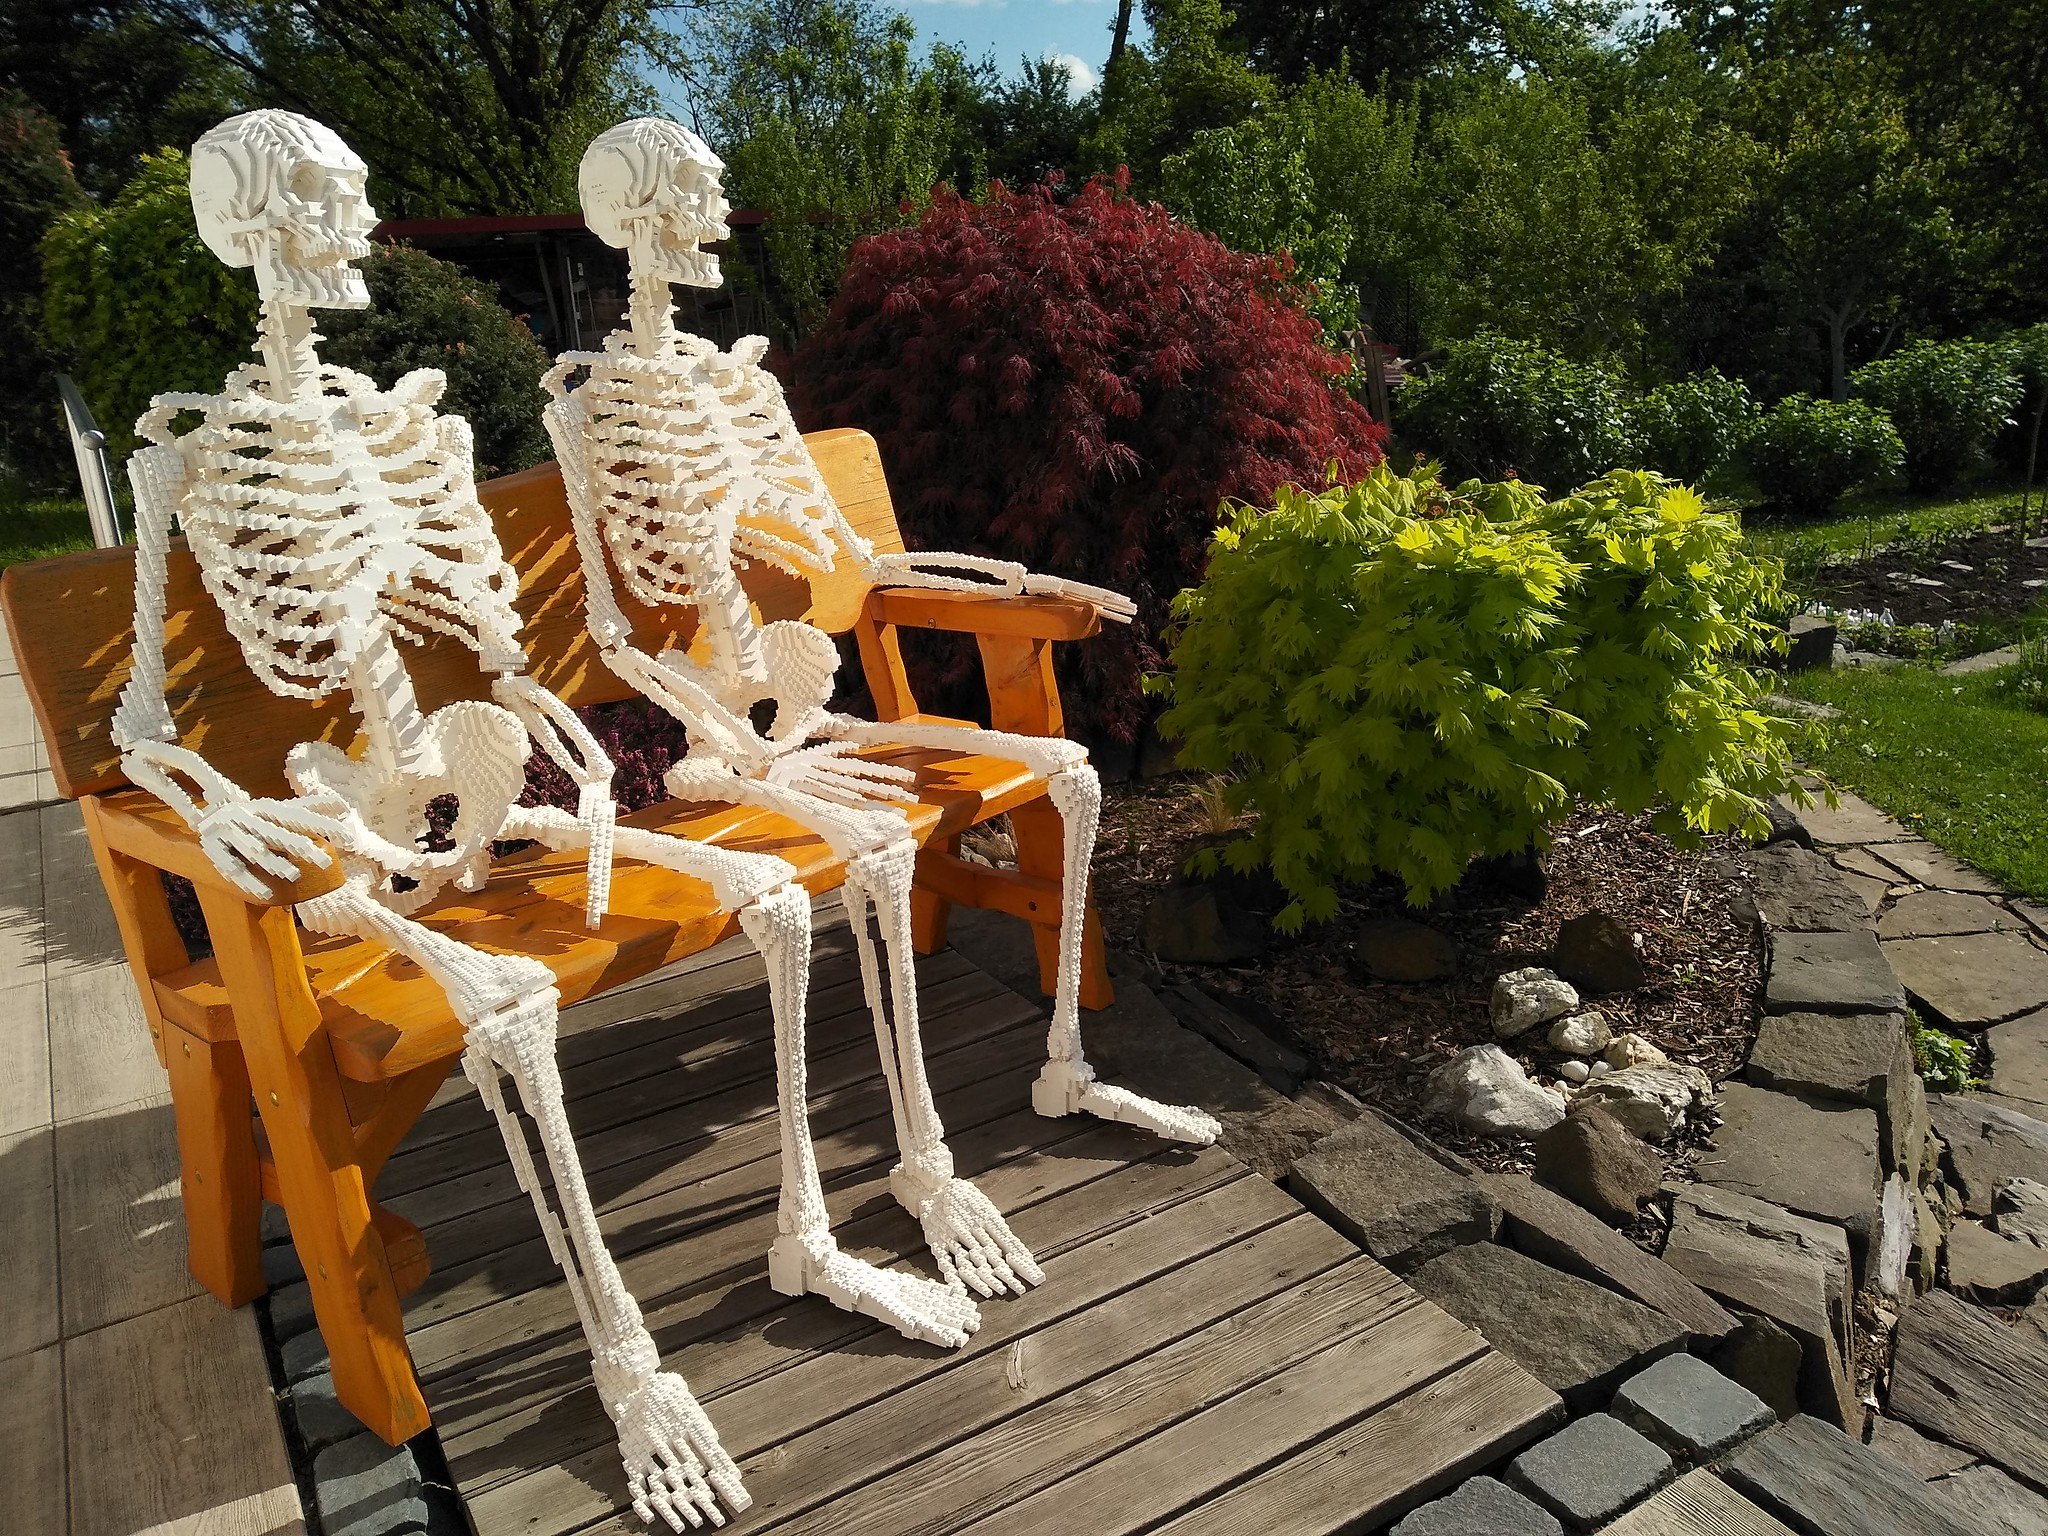 LEGO skeletons